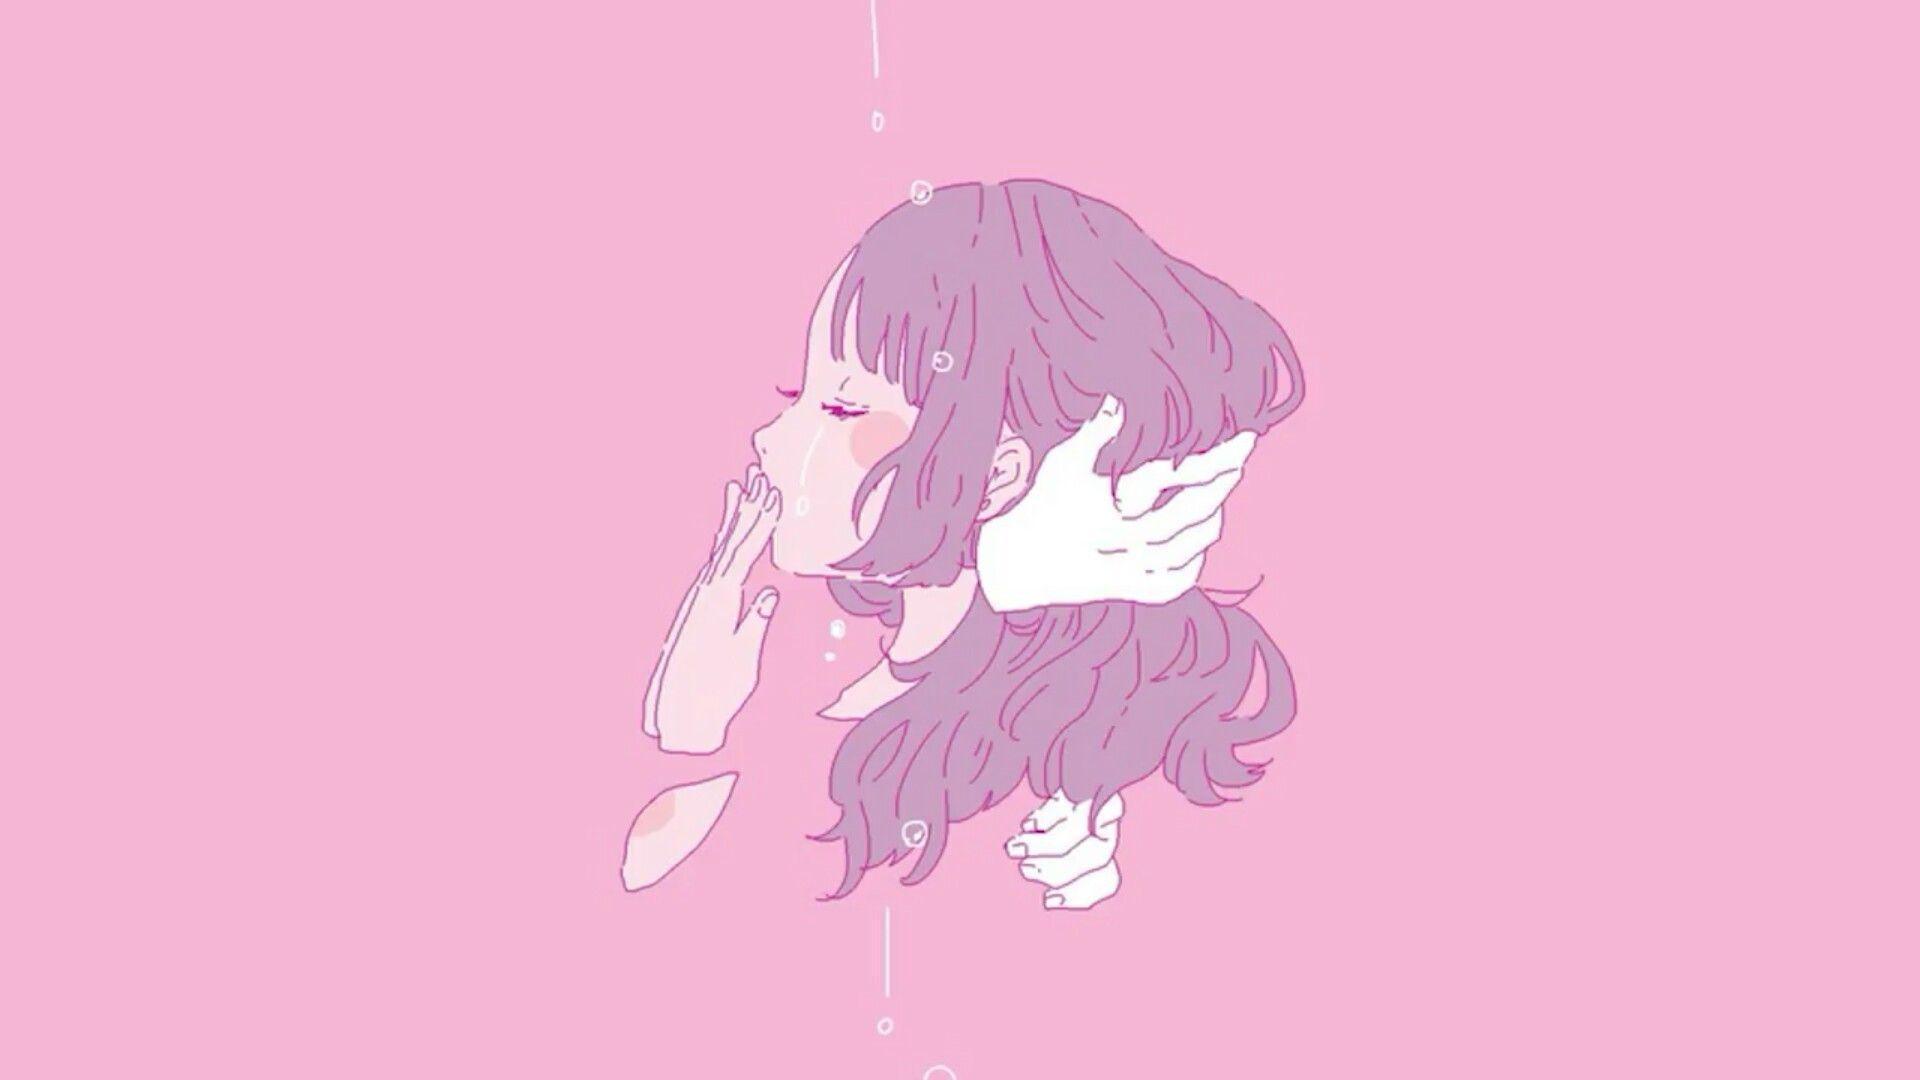 Pink 1920x1080 Tumblr Gamer Girl Wallpapers Wallpaper Cave